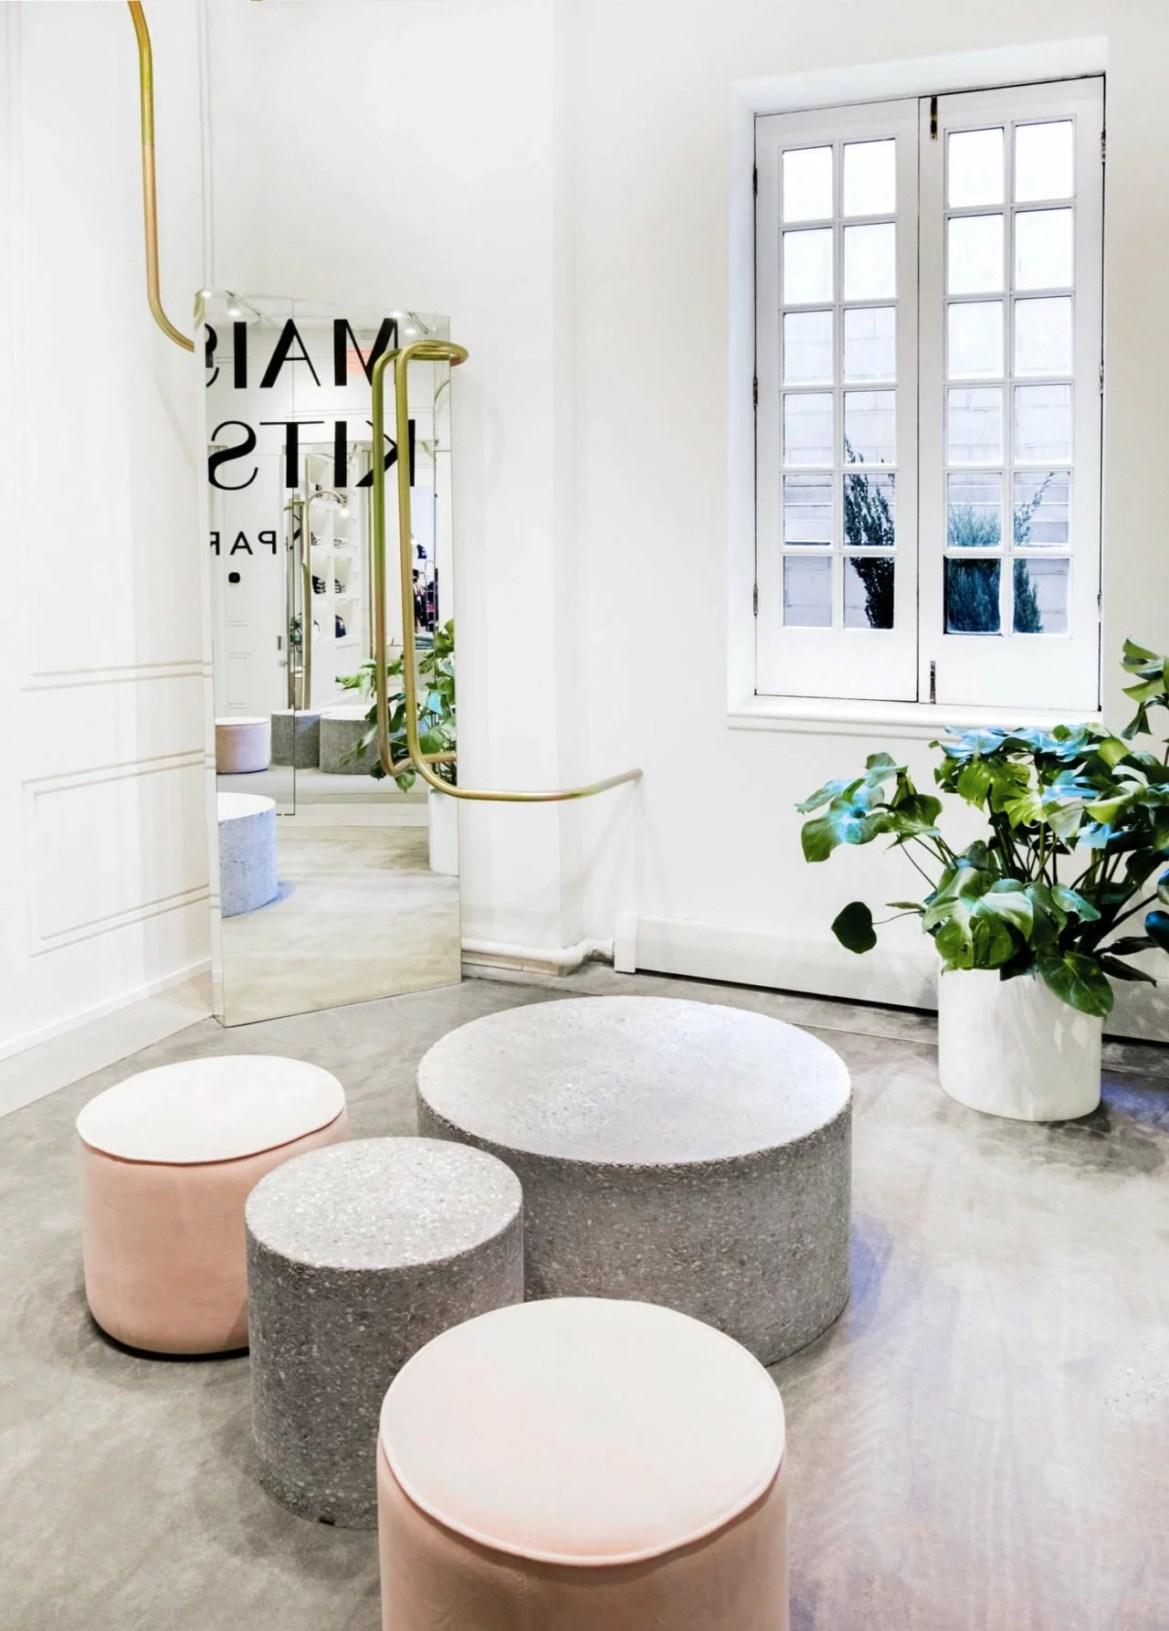 Maison Kitsuné New York, Mathieu Lehanneur